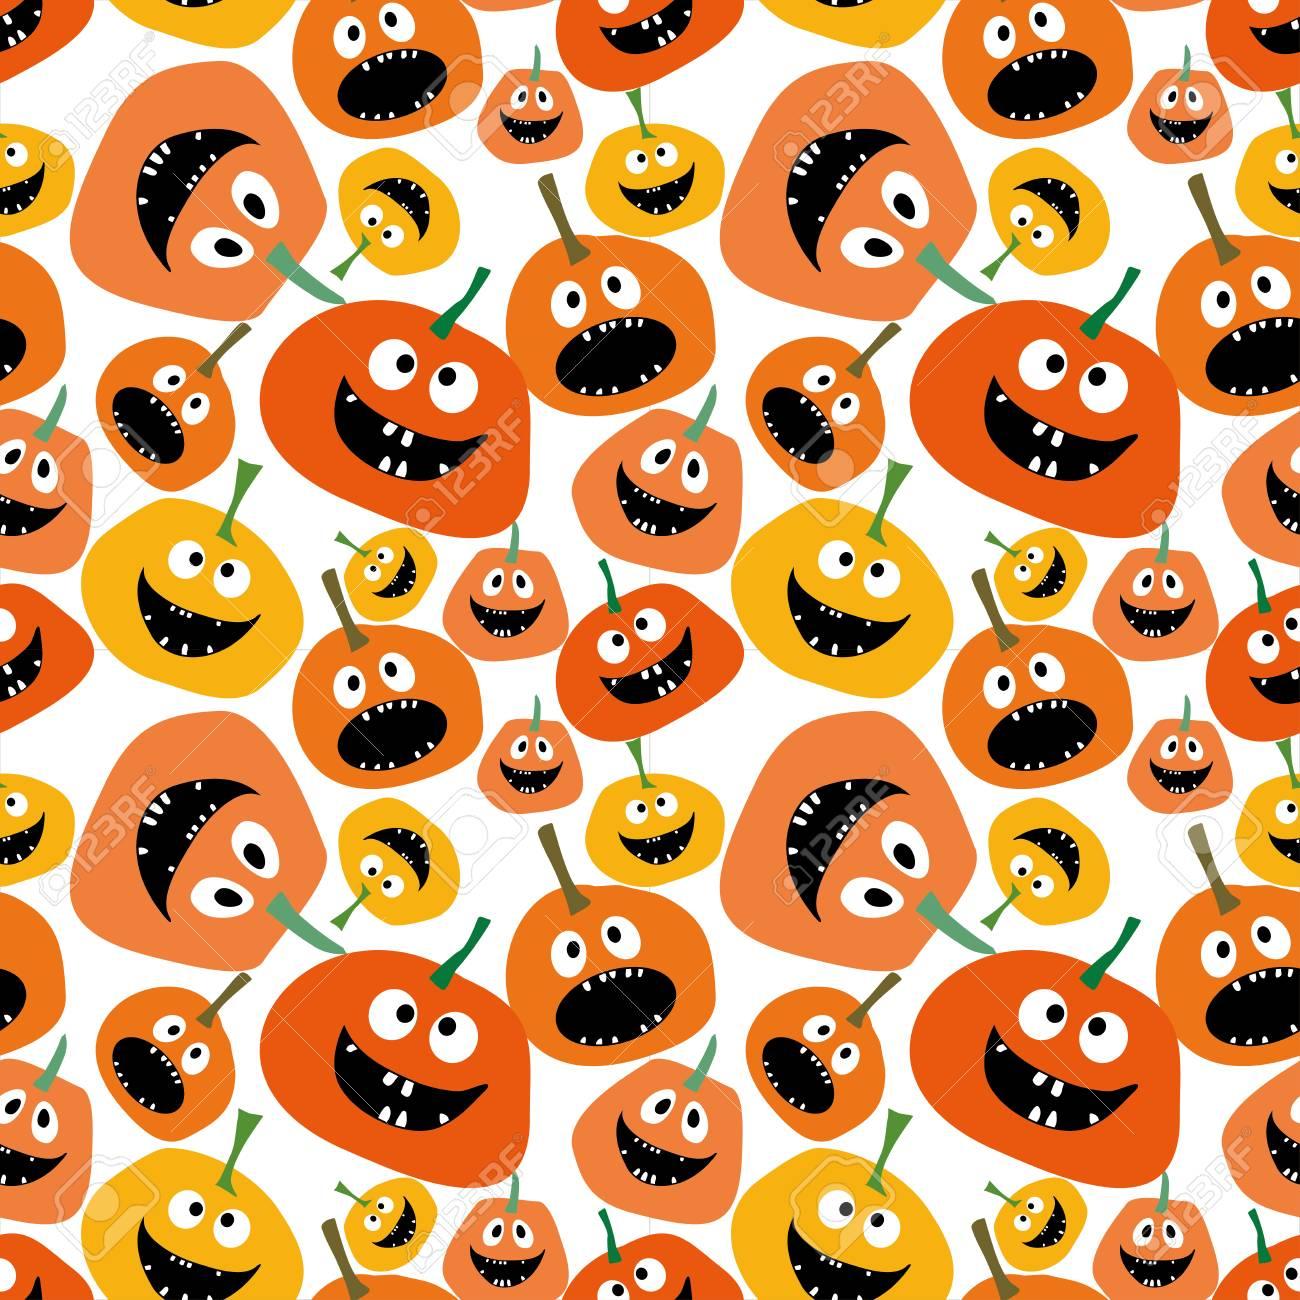 Pumpkin Seamless Pattern On White Background Pumpkin Seamless